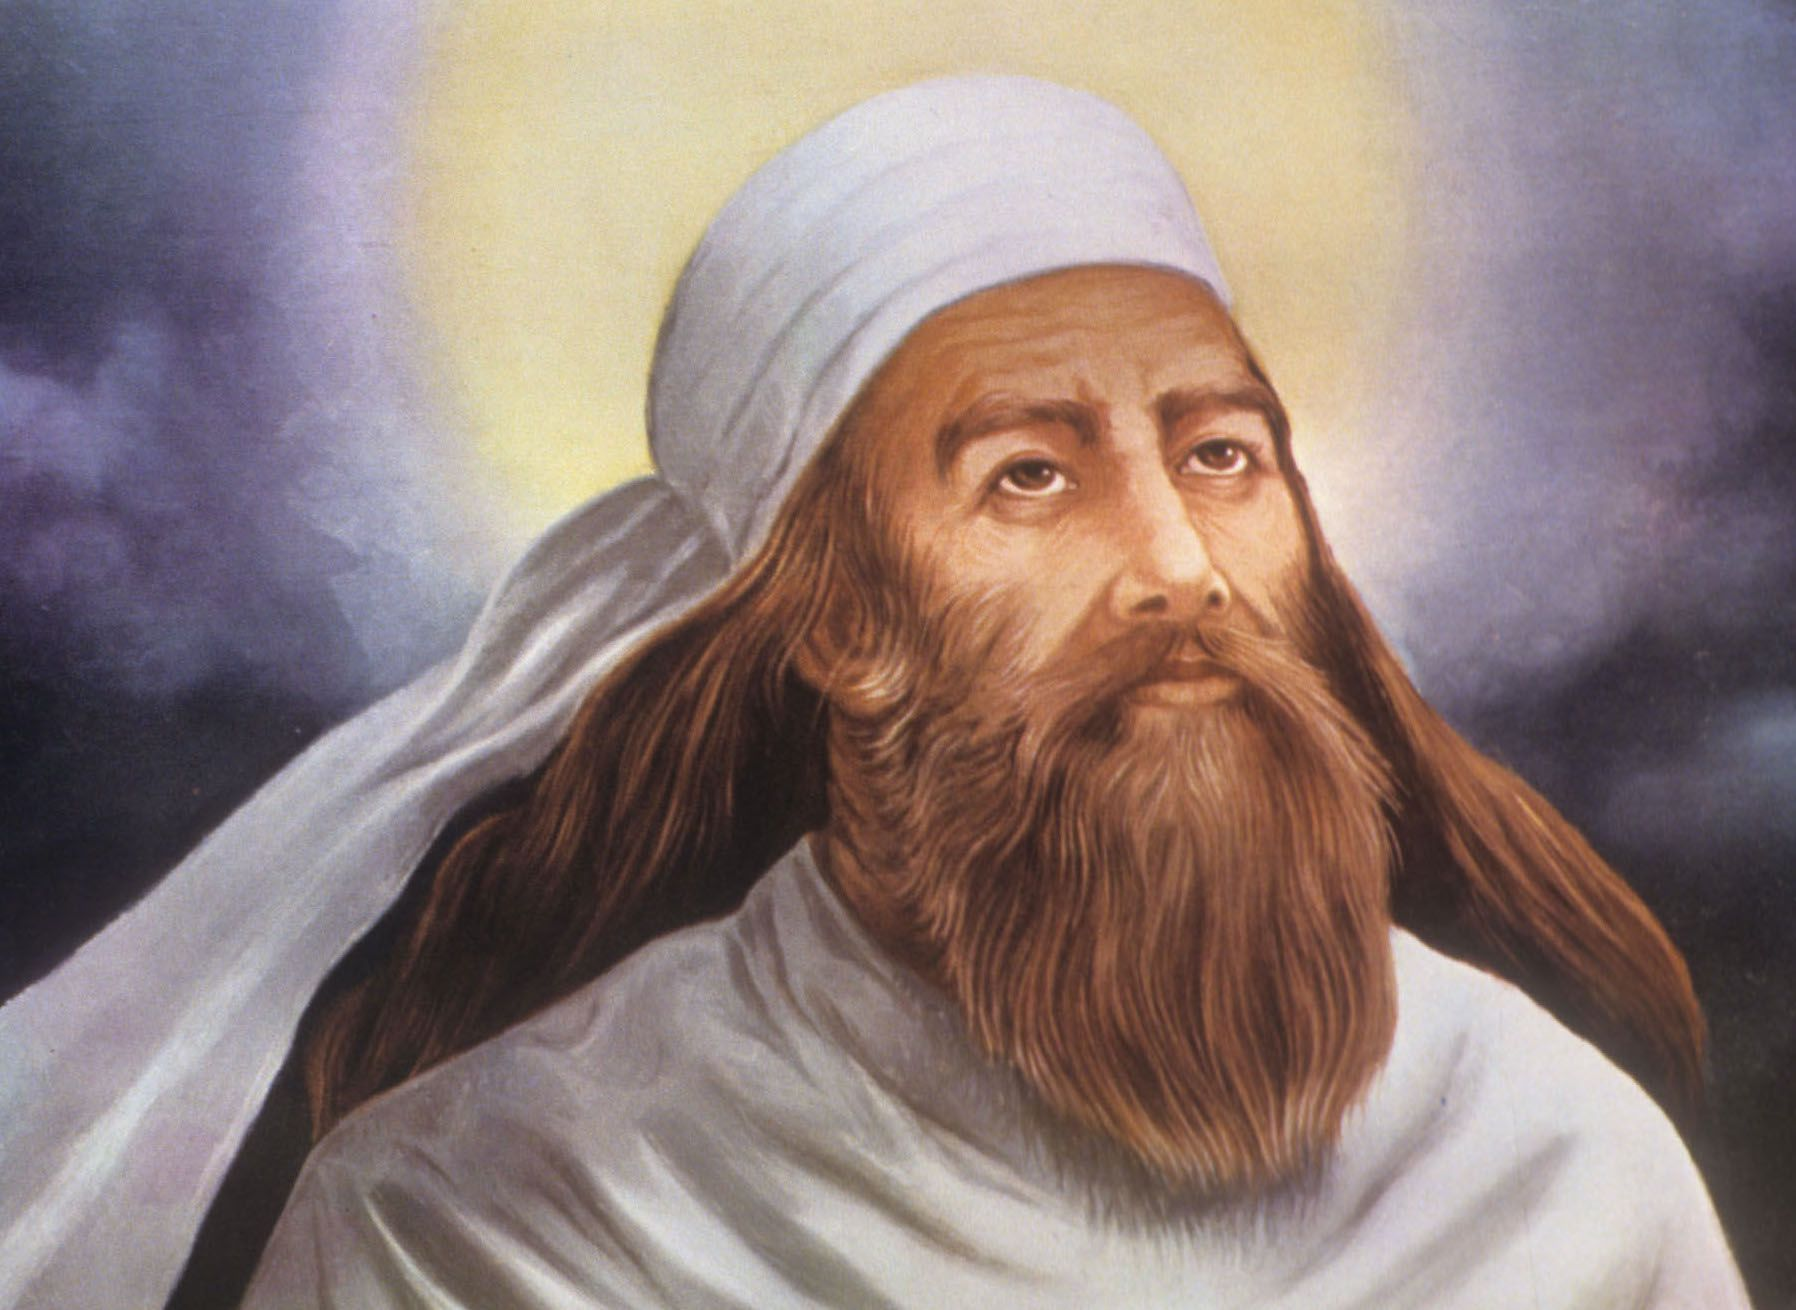 Biography of Zarathustra, Founder of Zoroastrianism